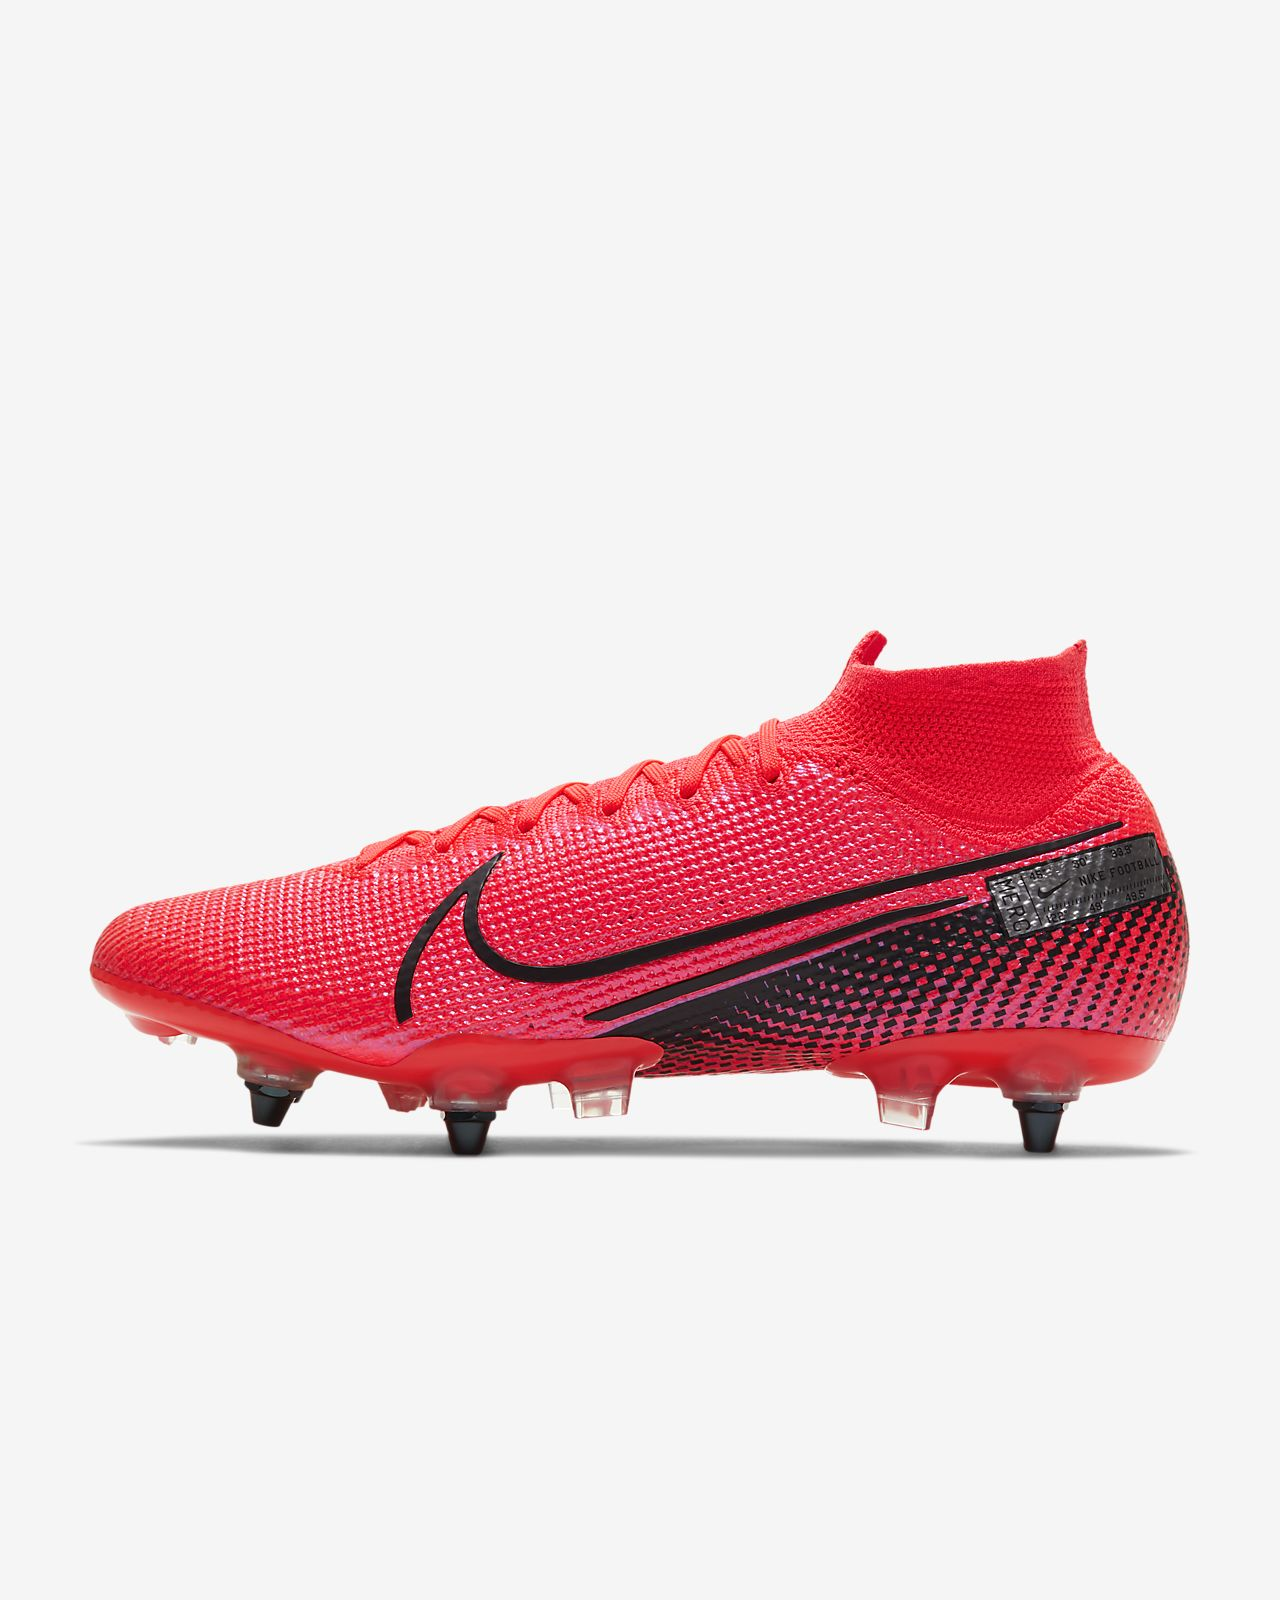 Chaussure de football à crampons pour terrain gras Nike Mercurial Superfly 7 Elite SG PRO Anti Clog Traction